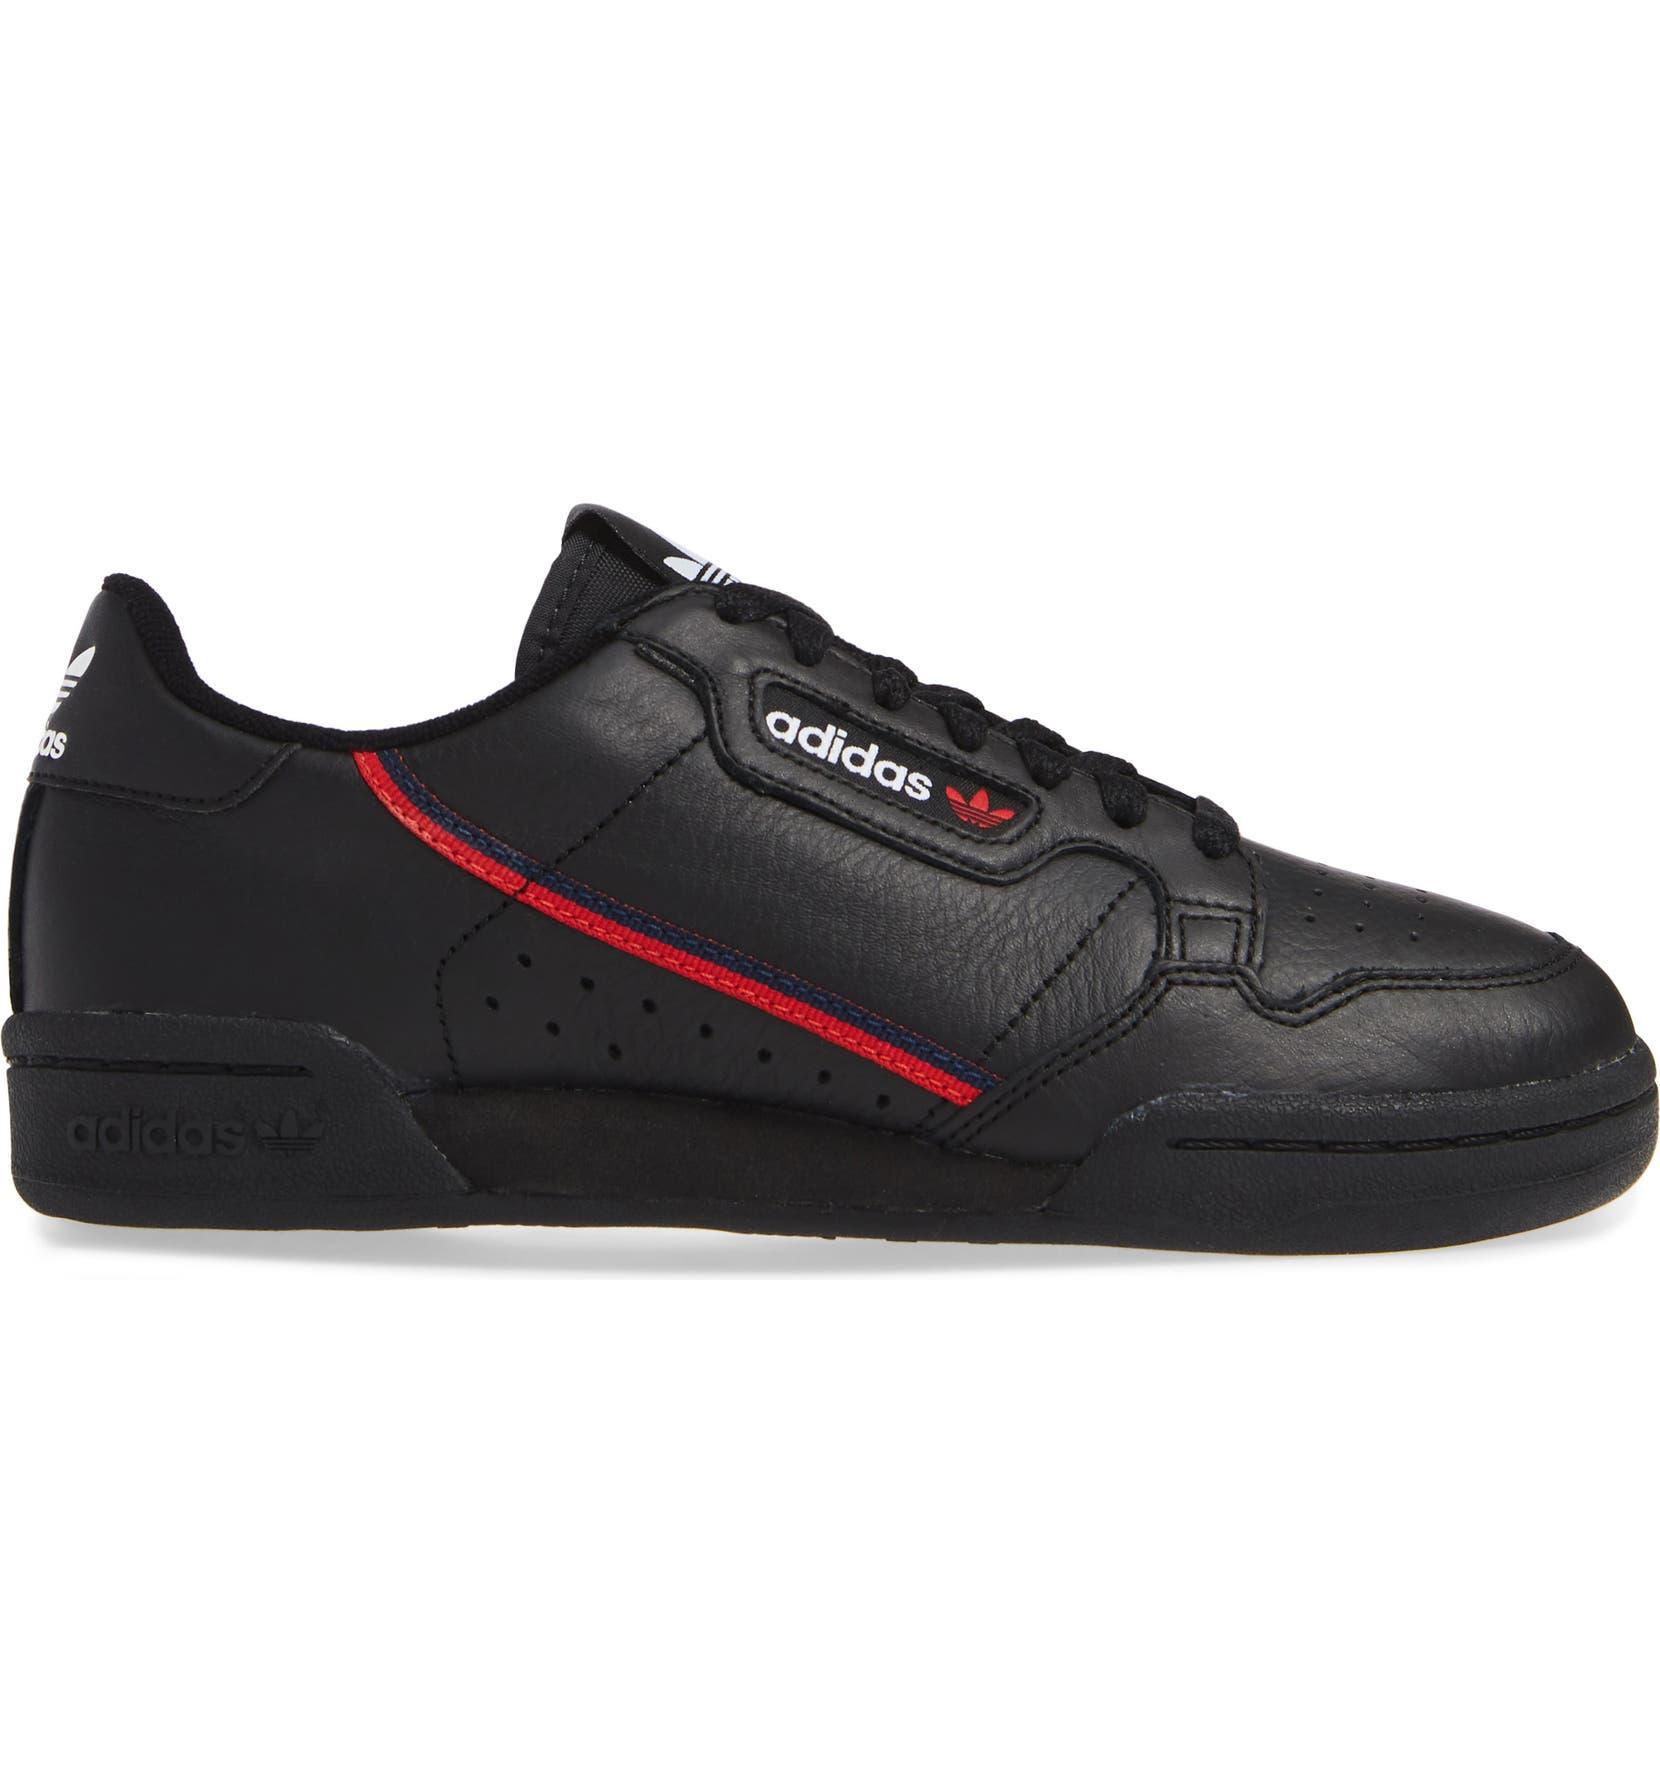 7cac0e29b3d adidas Continental 80 Sneaker (Unisex)